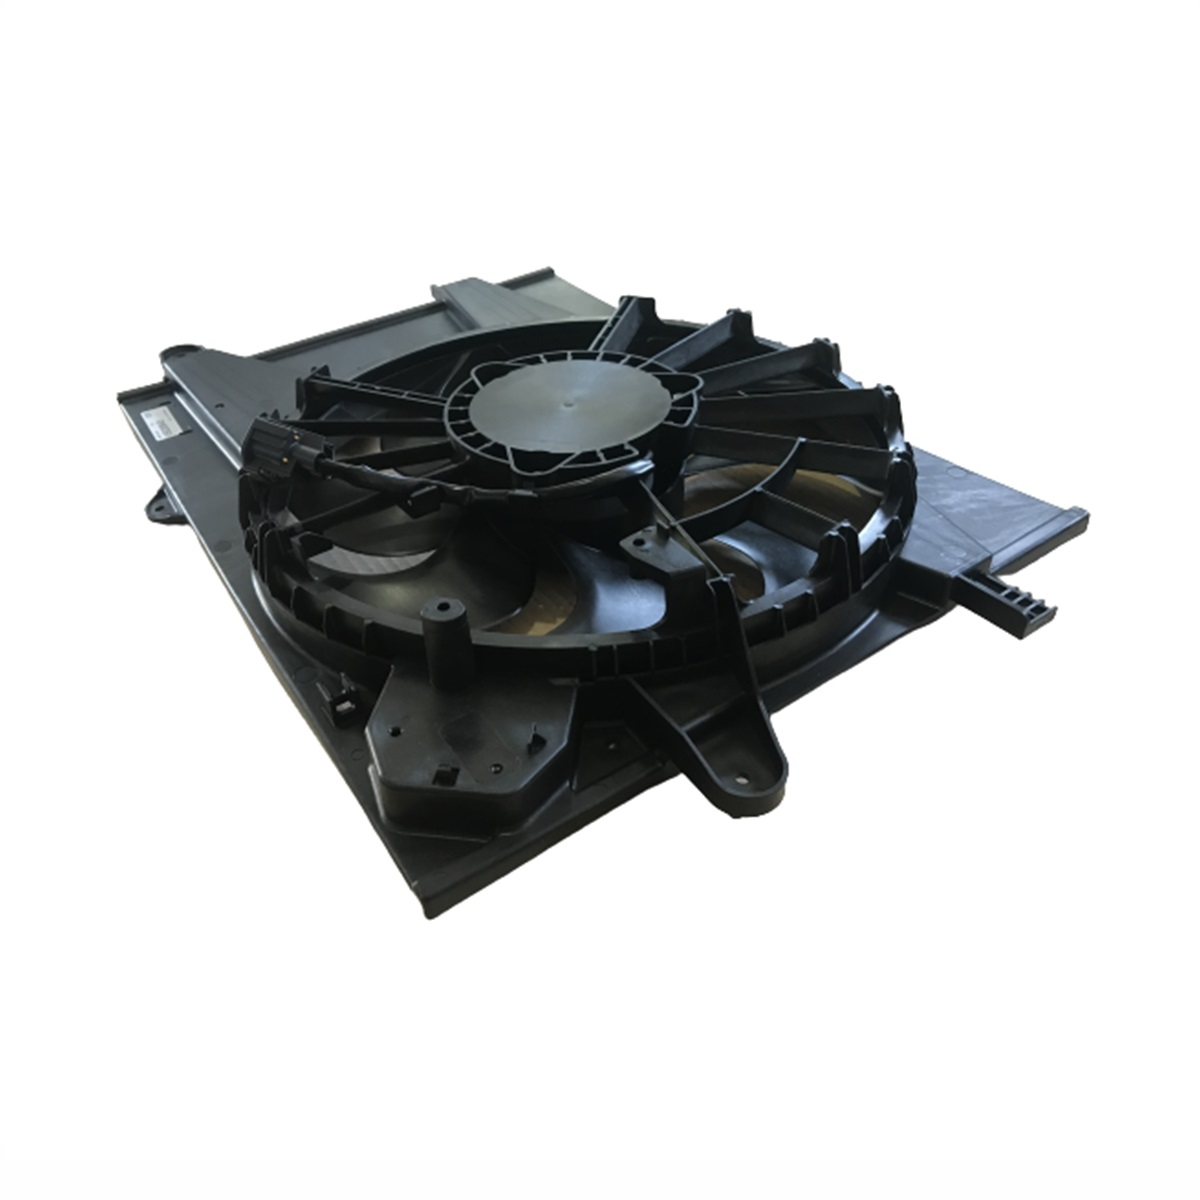 Eletroventilador Completo Gm Cobalt/ Onix/ Prisma/ Spin 1.0/1.4/1.6/1.8 17/19 Flex Manual